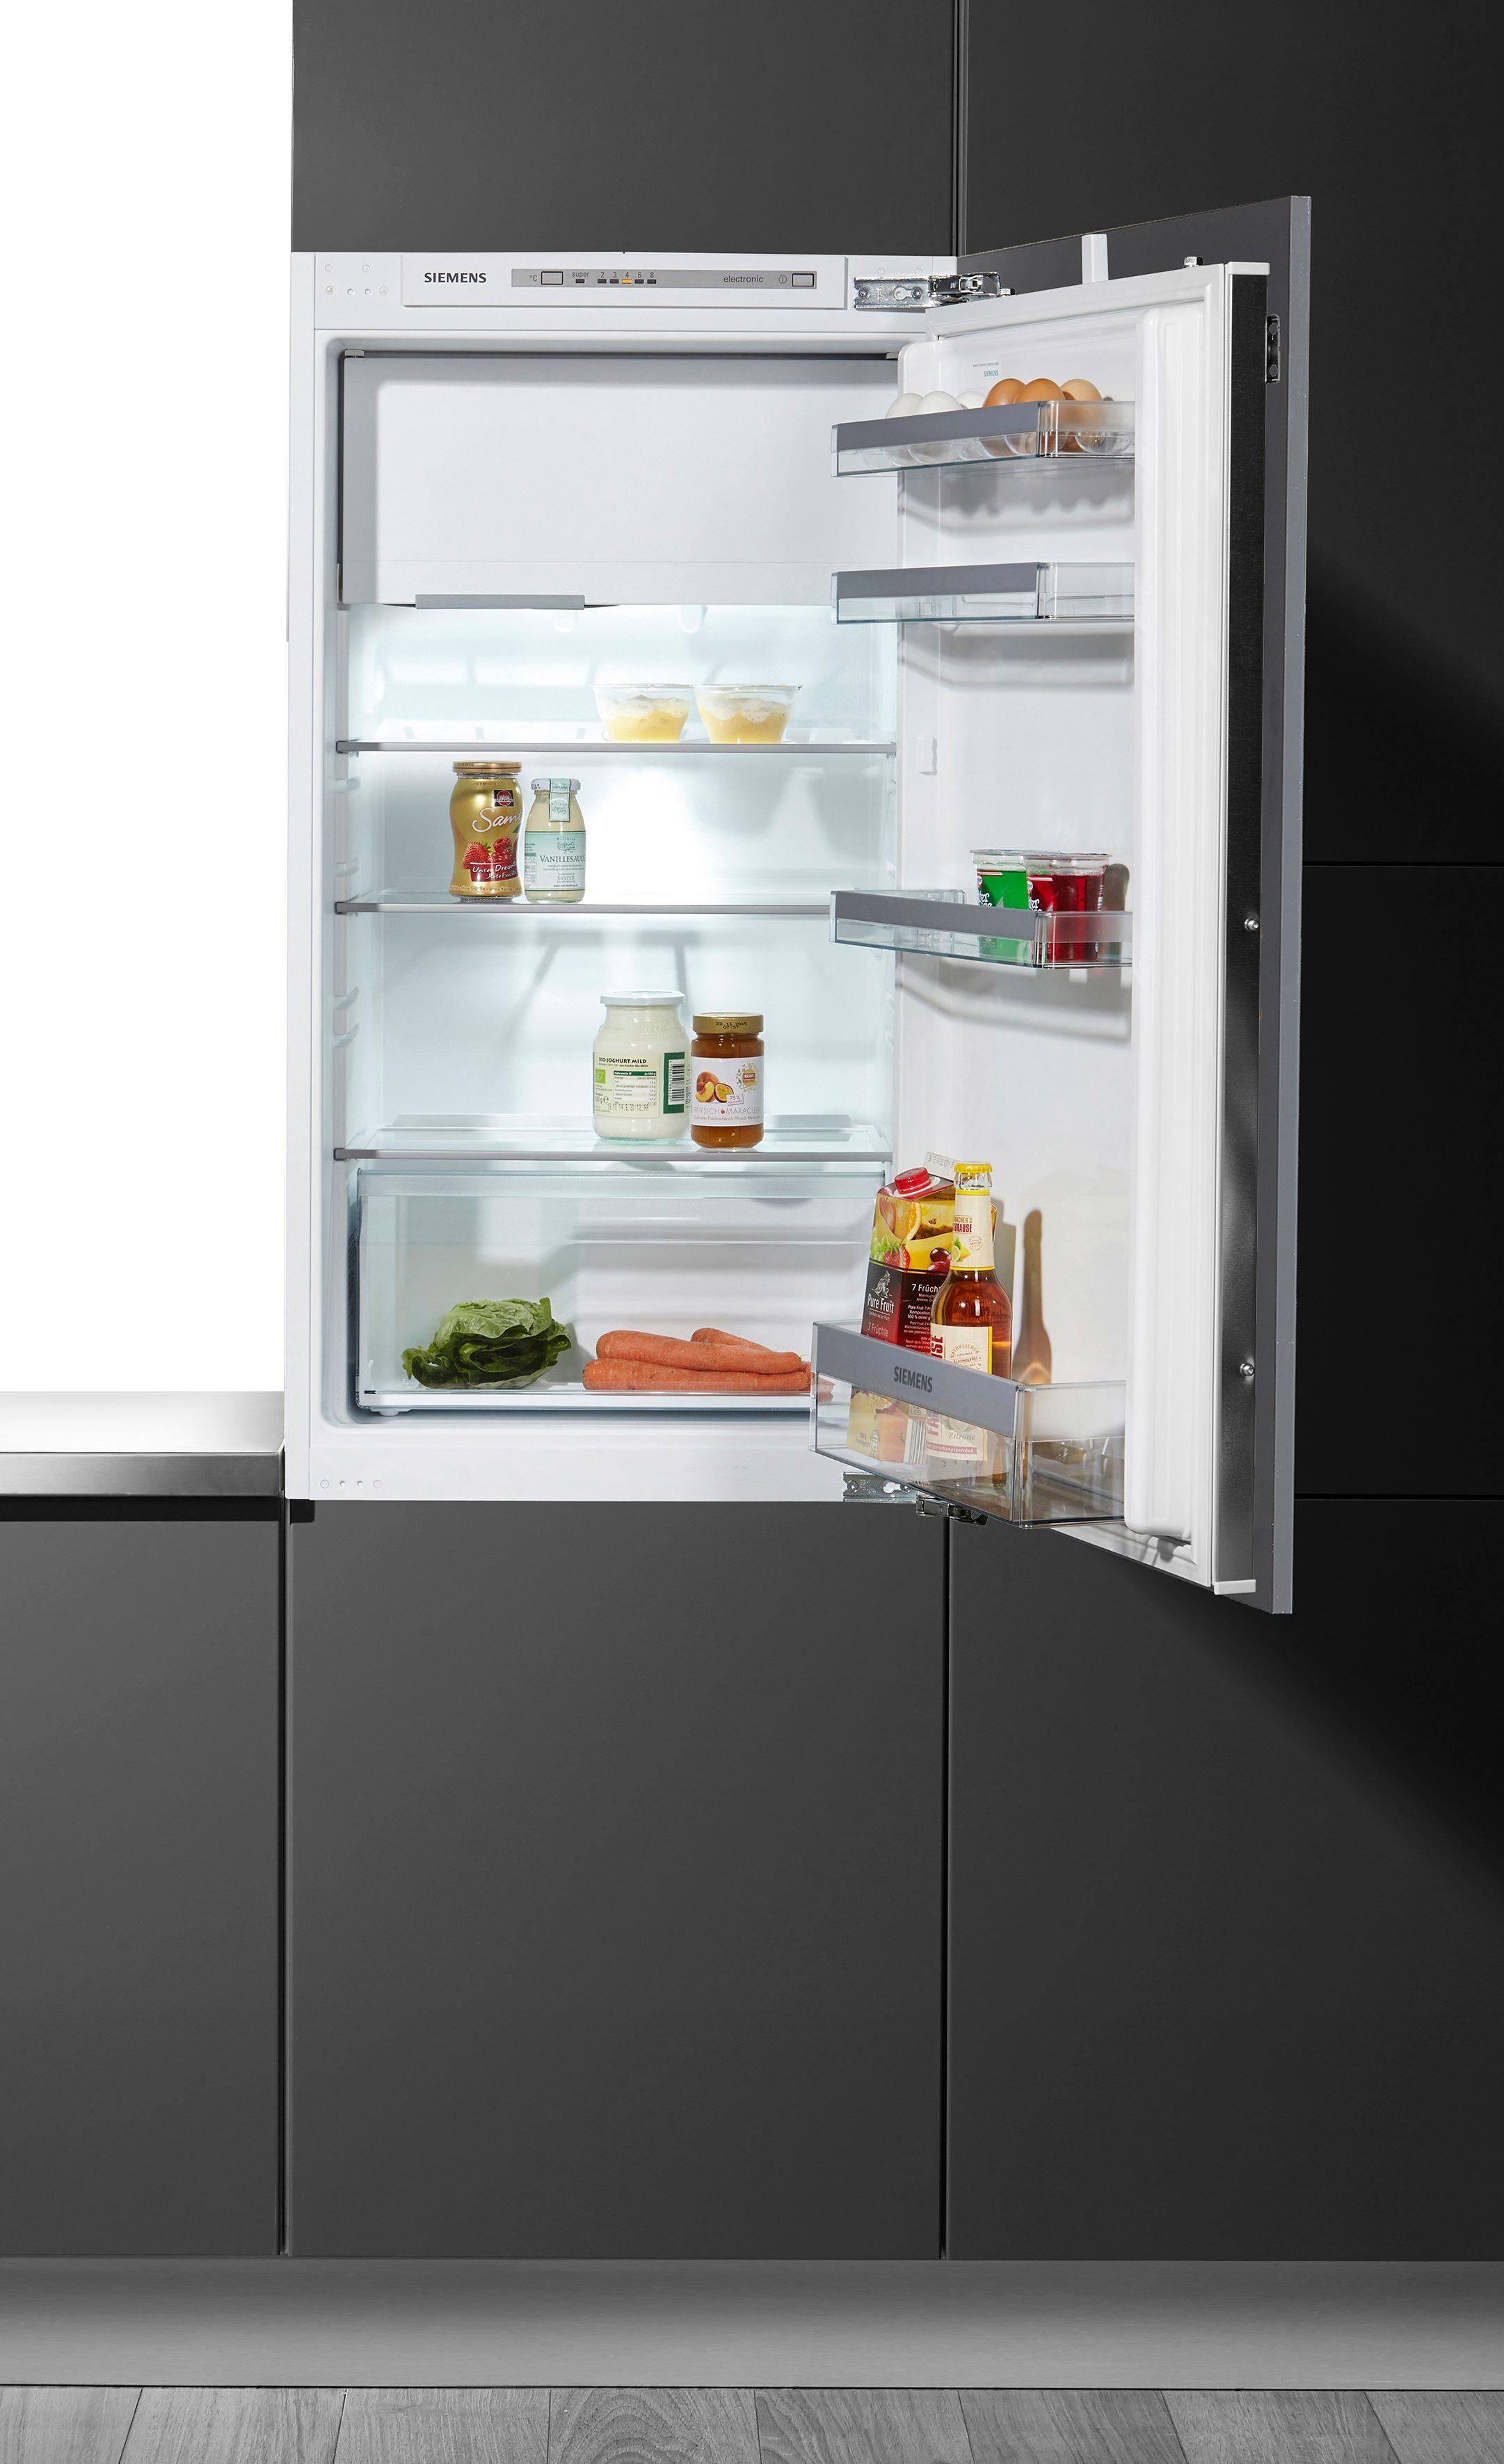 Siemens Einbau-Kühlautomat KI32LVF30, A++, 102,1 cm hoch